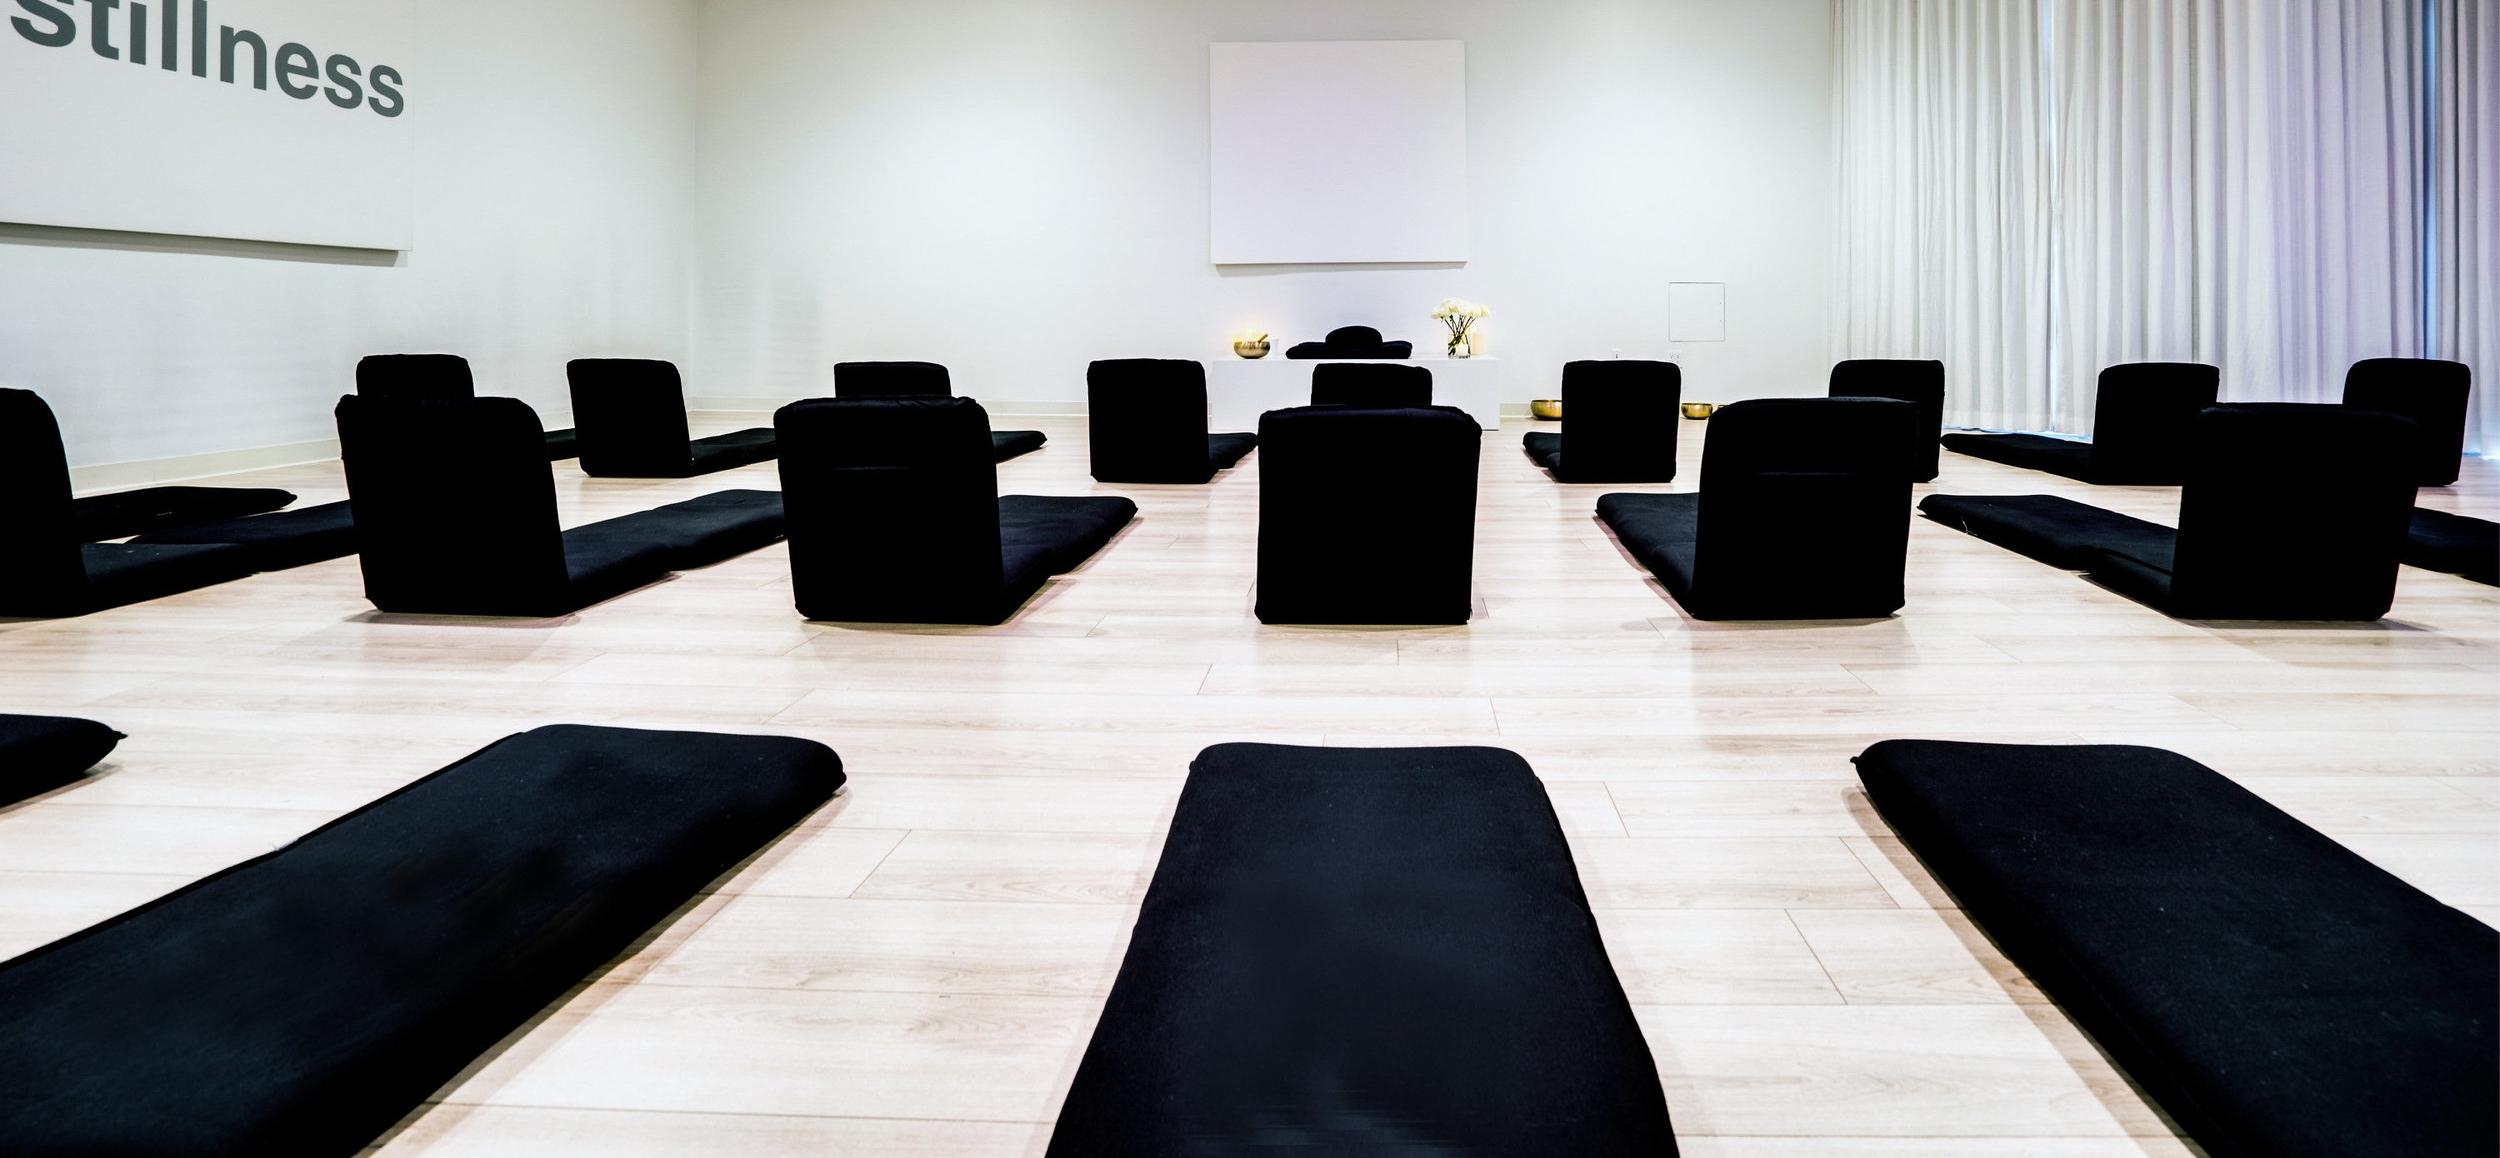 04_Unplug_Meditation_photo_by_SupremeScene.com_Robert_Packar.jpg